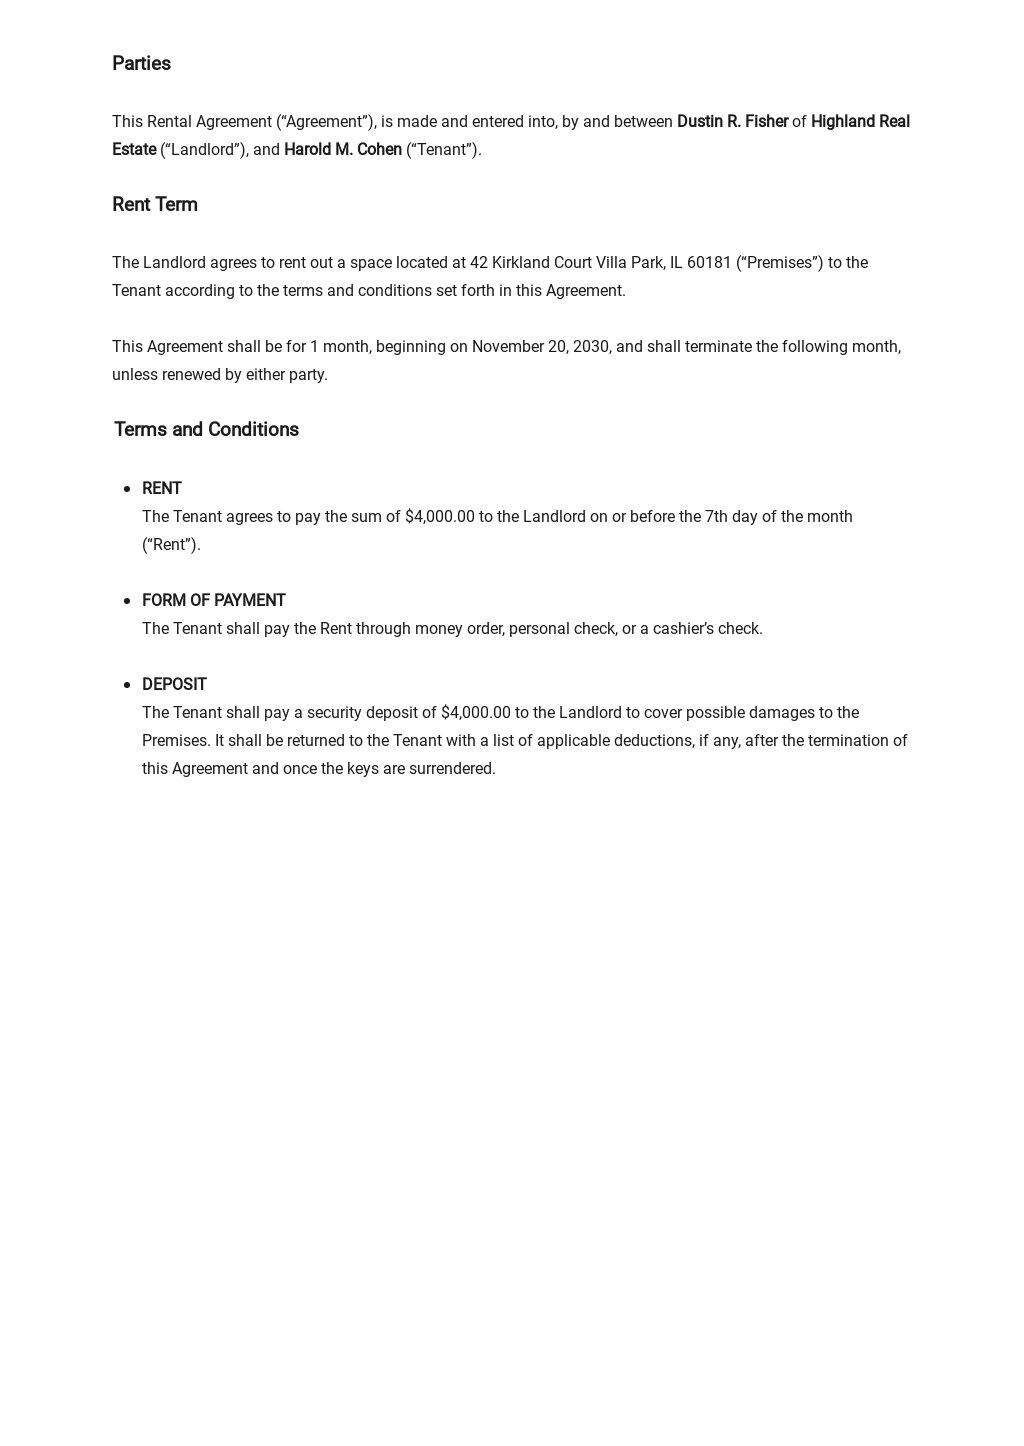 Rental Agreement Template [Free PDF] - Google Docs, Word, Apple Pages, PDF